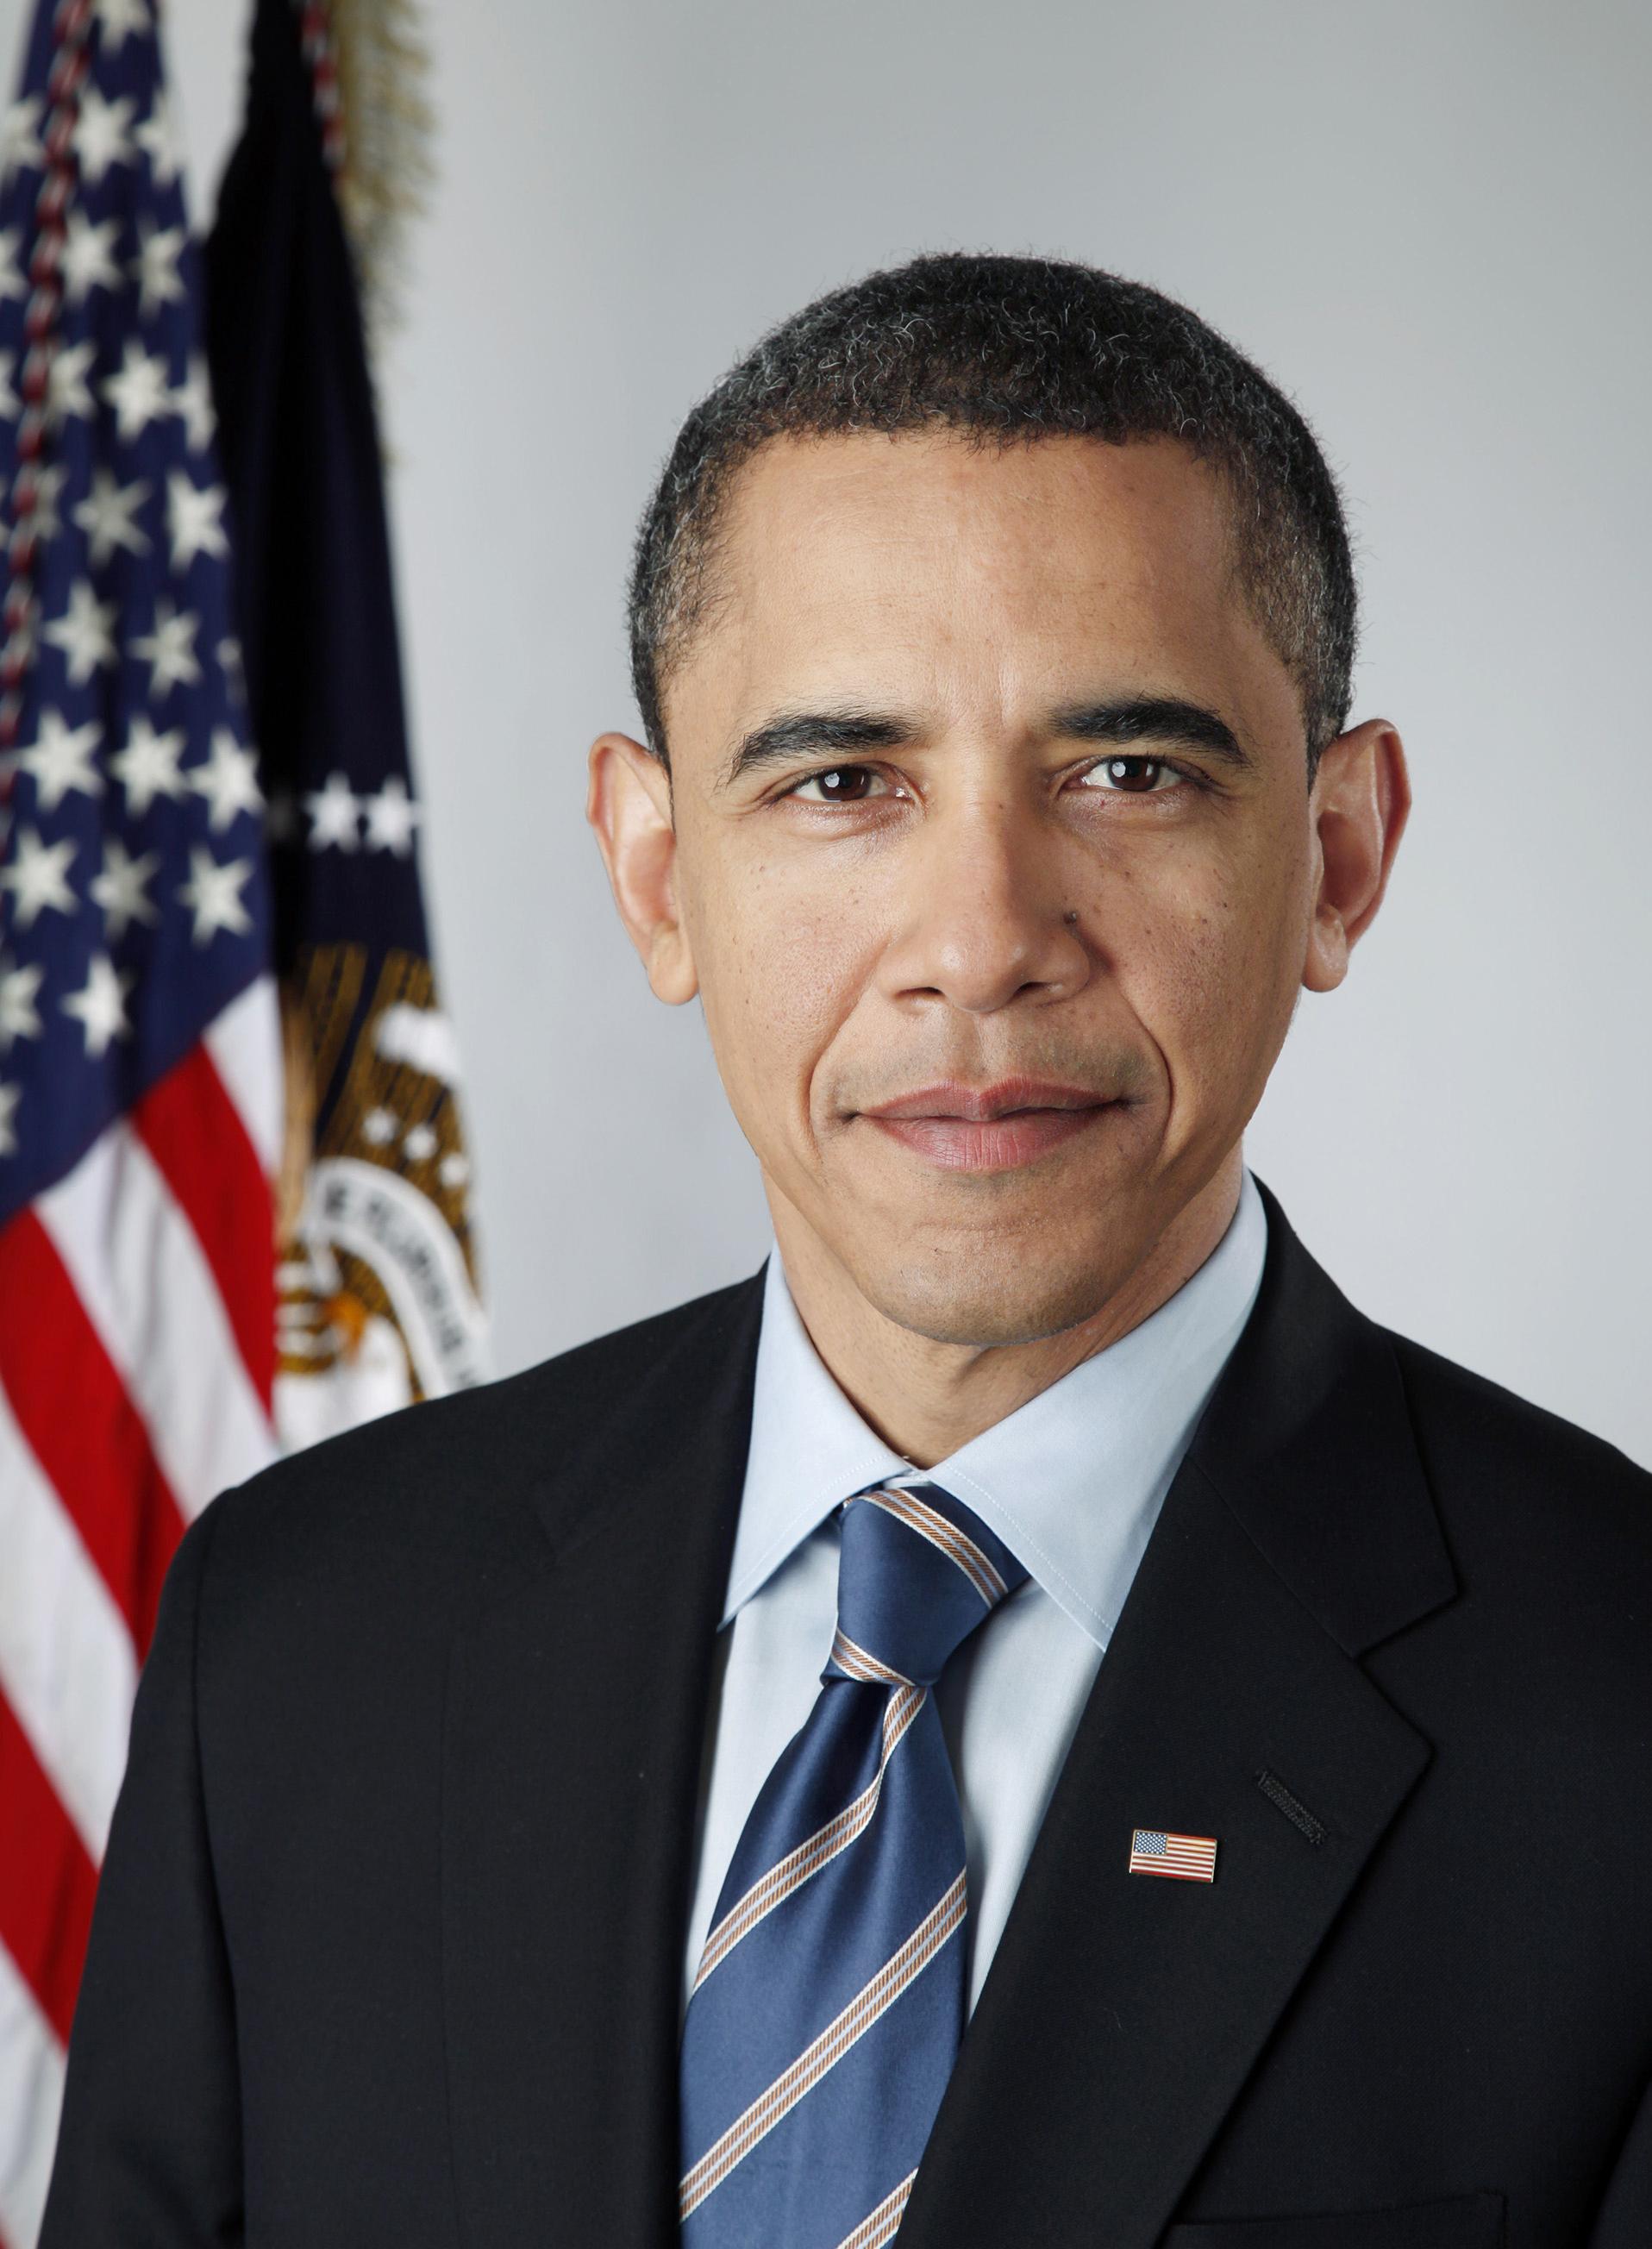 Obama 60 - Copy (2) - Copy.jpg